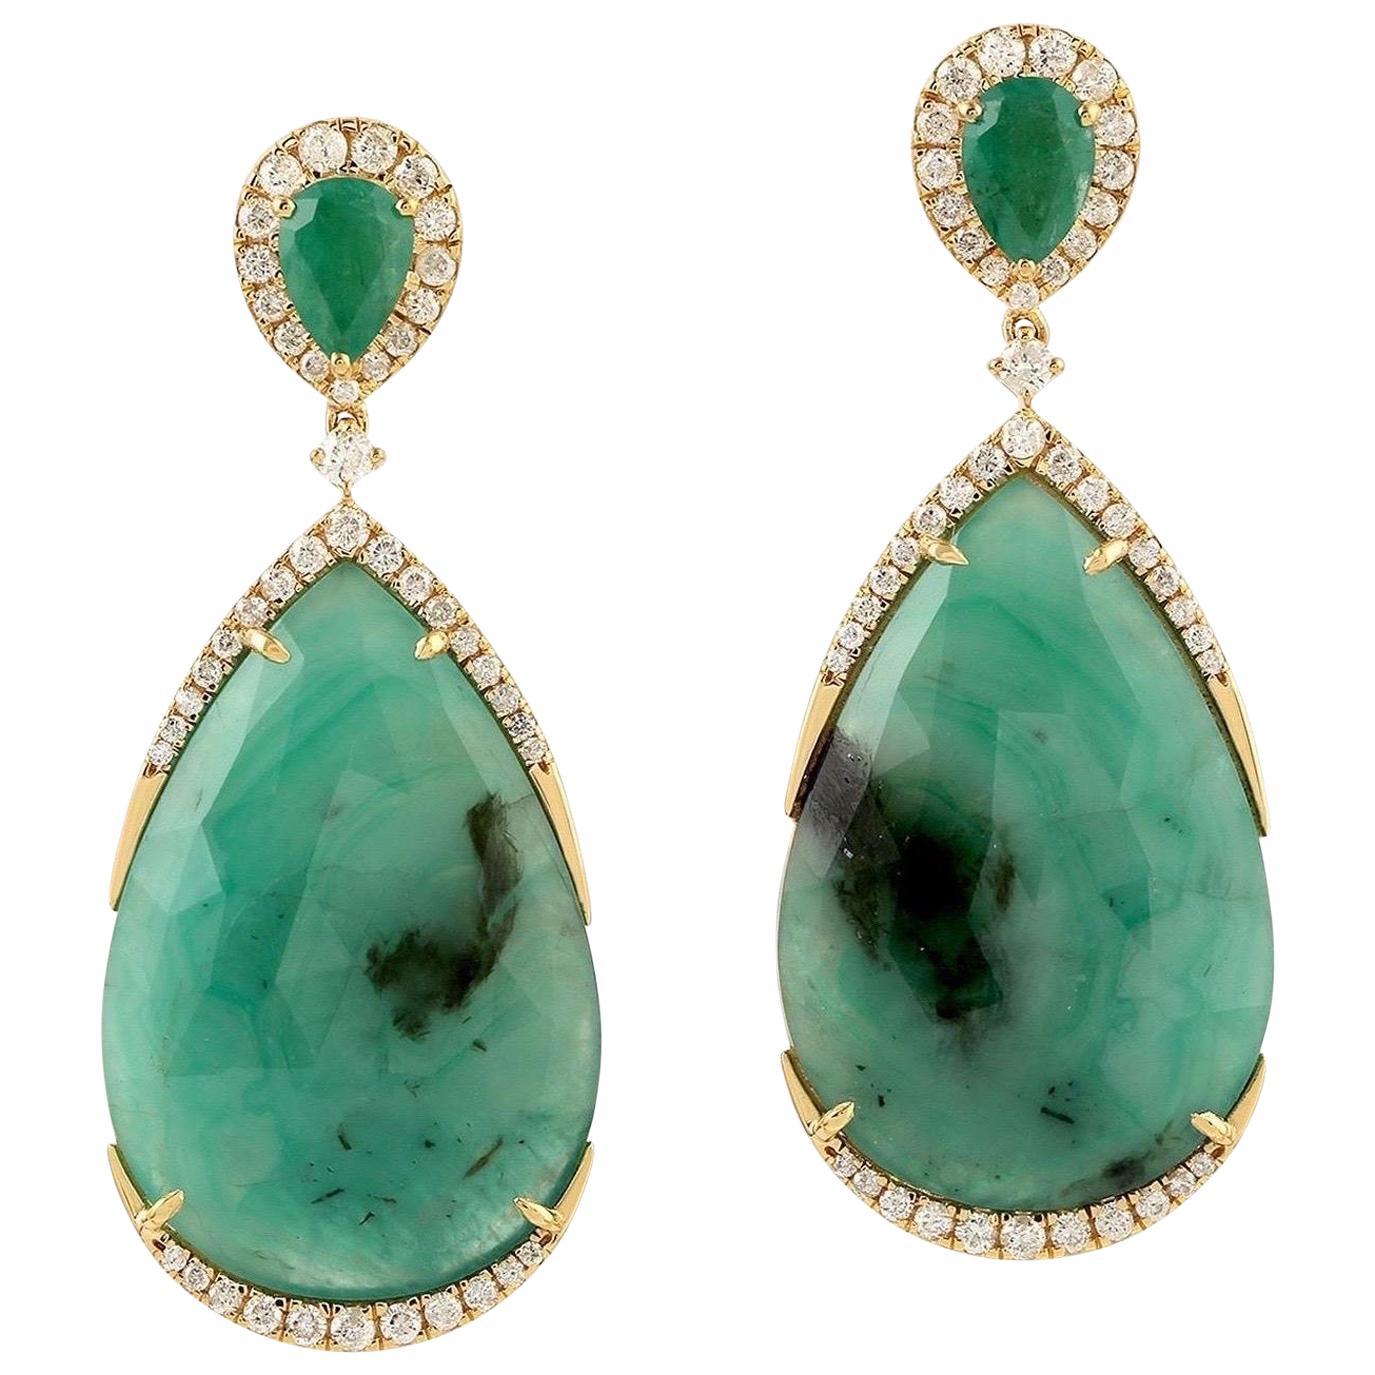 29.43 Carat Emerald Diamond 18 Karat Gold Earrings